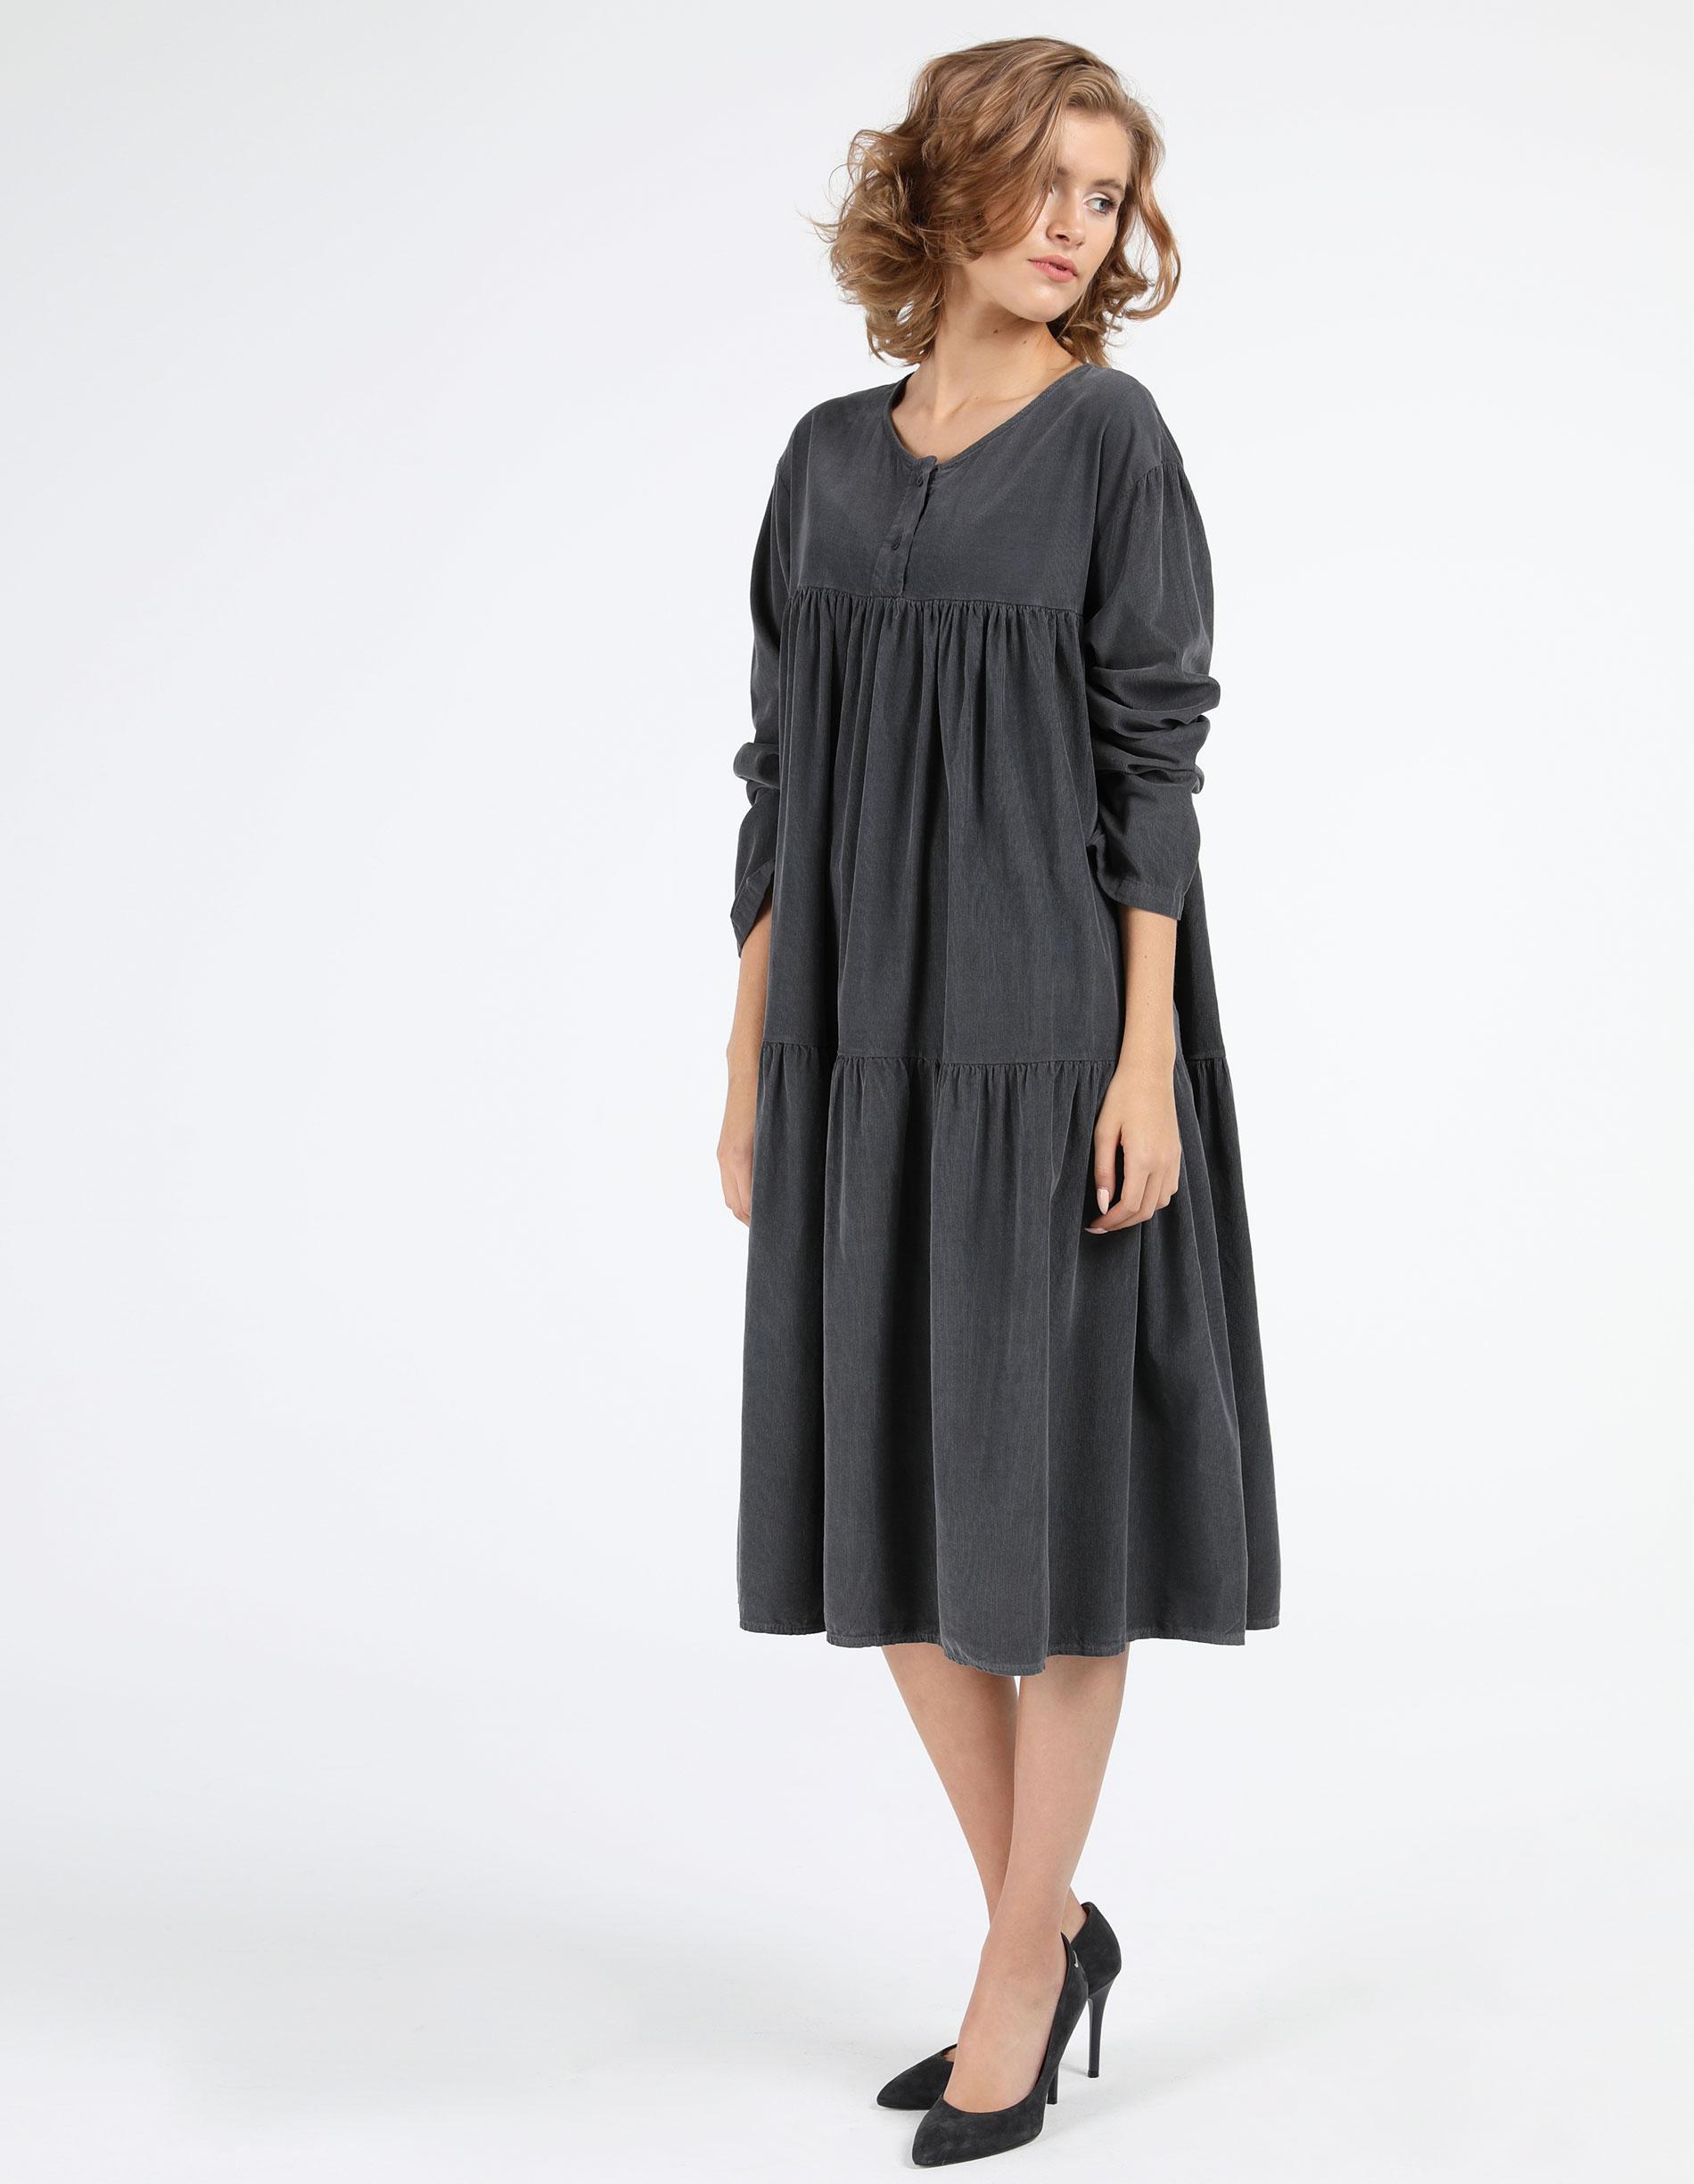 Sukienka - 4-4058 PIOMBO - Unisono